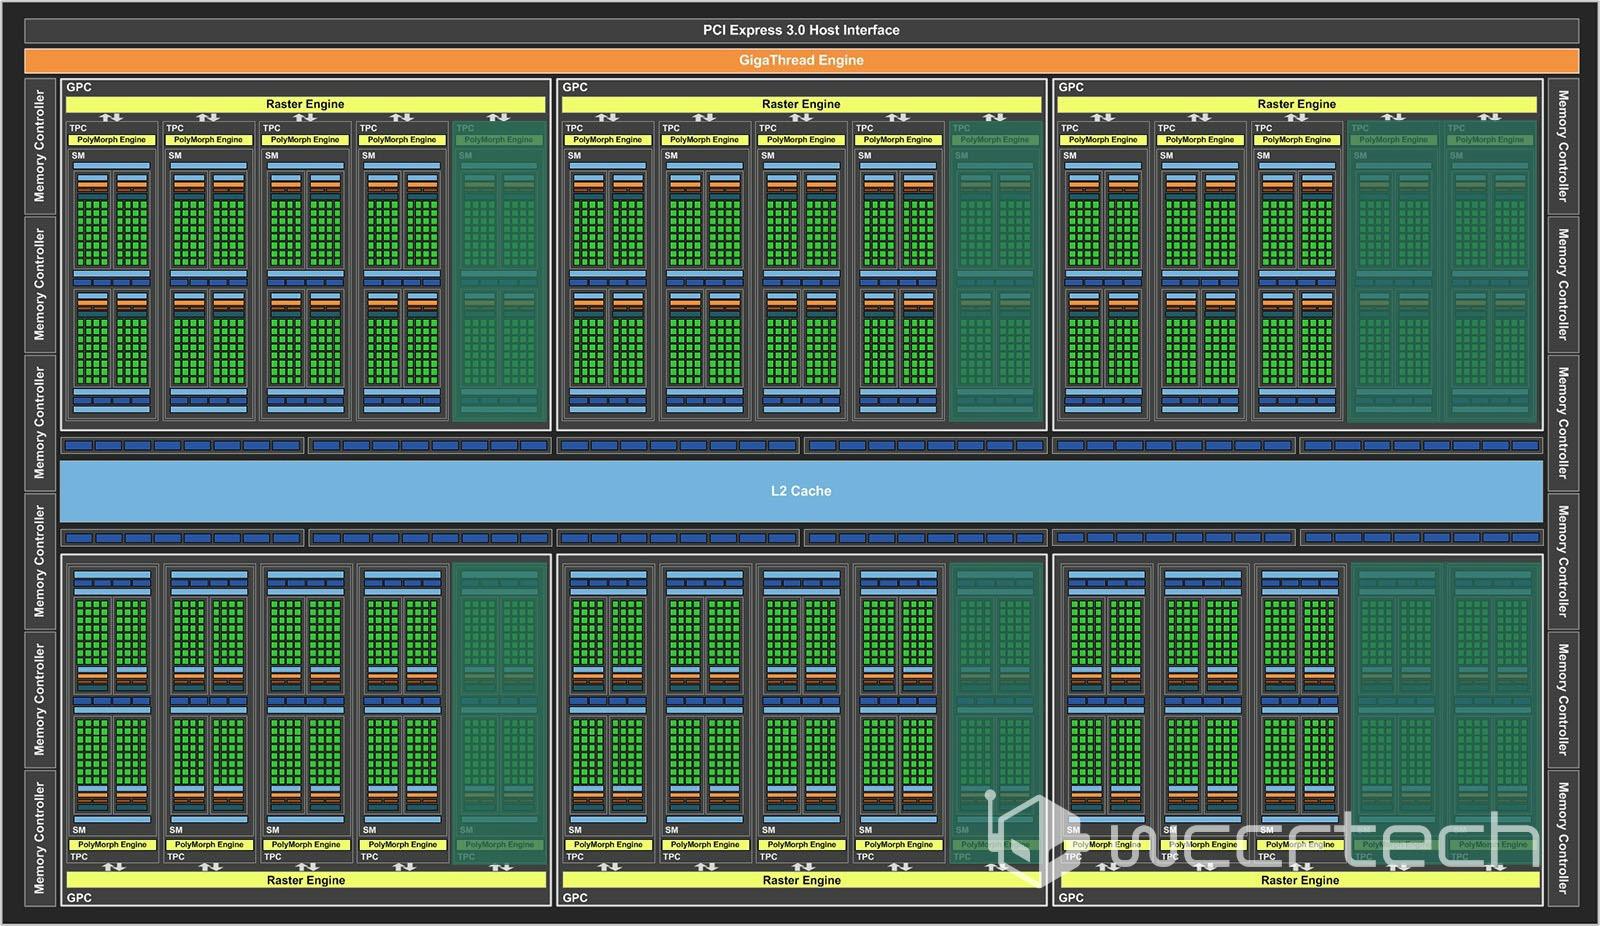 Nvidia GeForce GTX 1080 Ti Block Diagram Watermarked